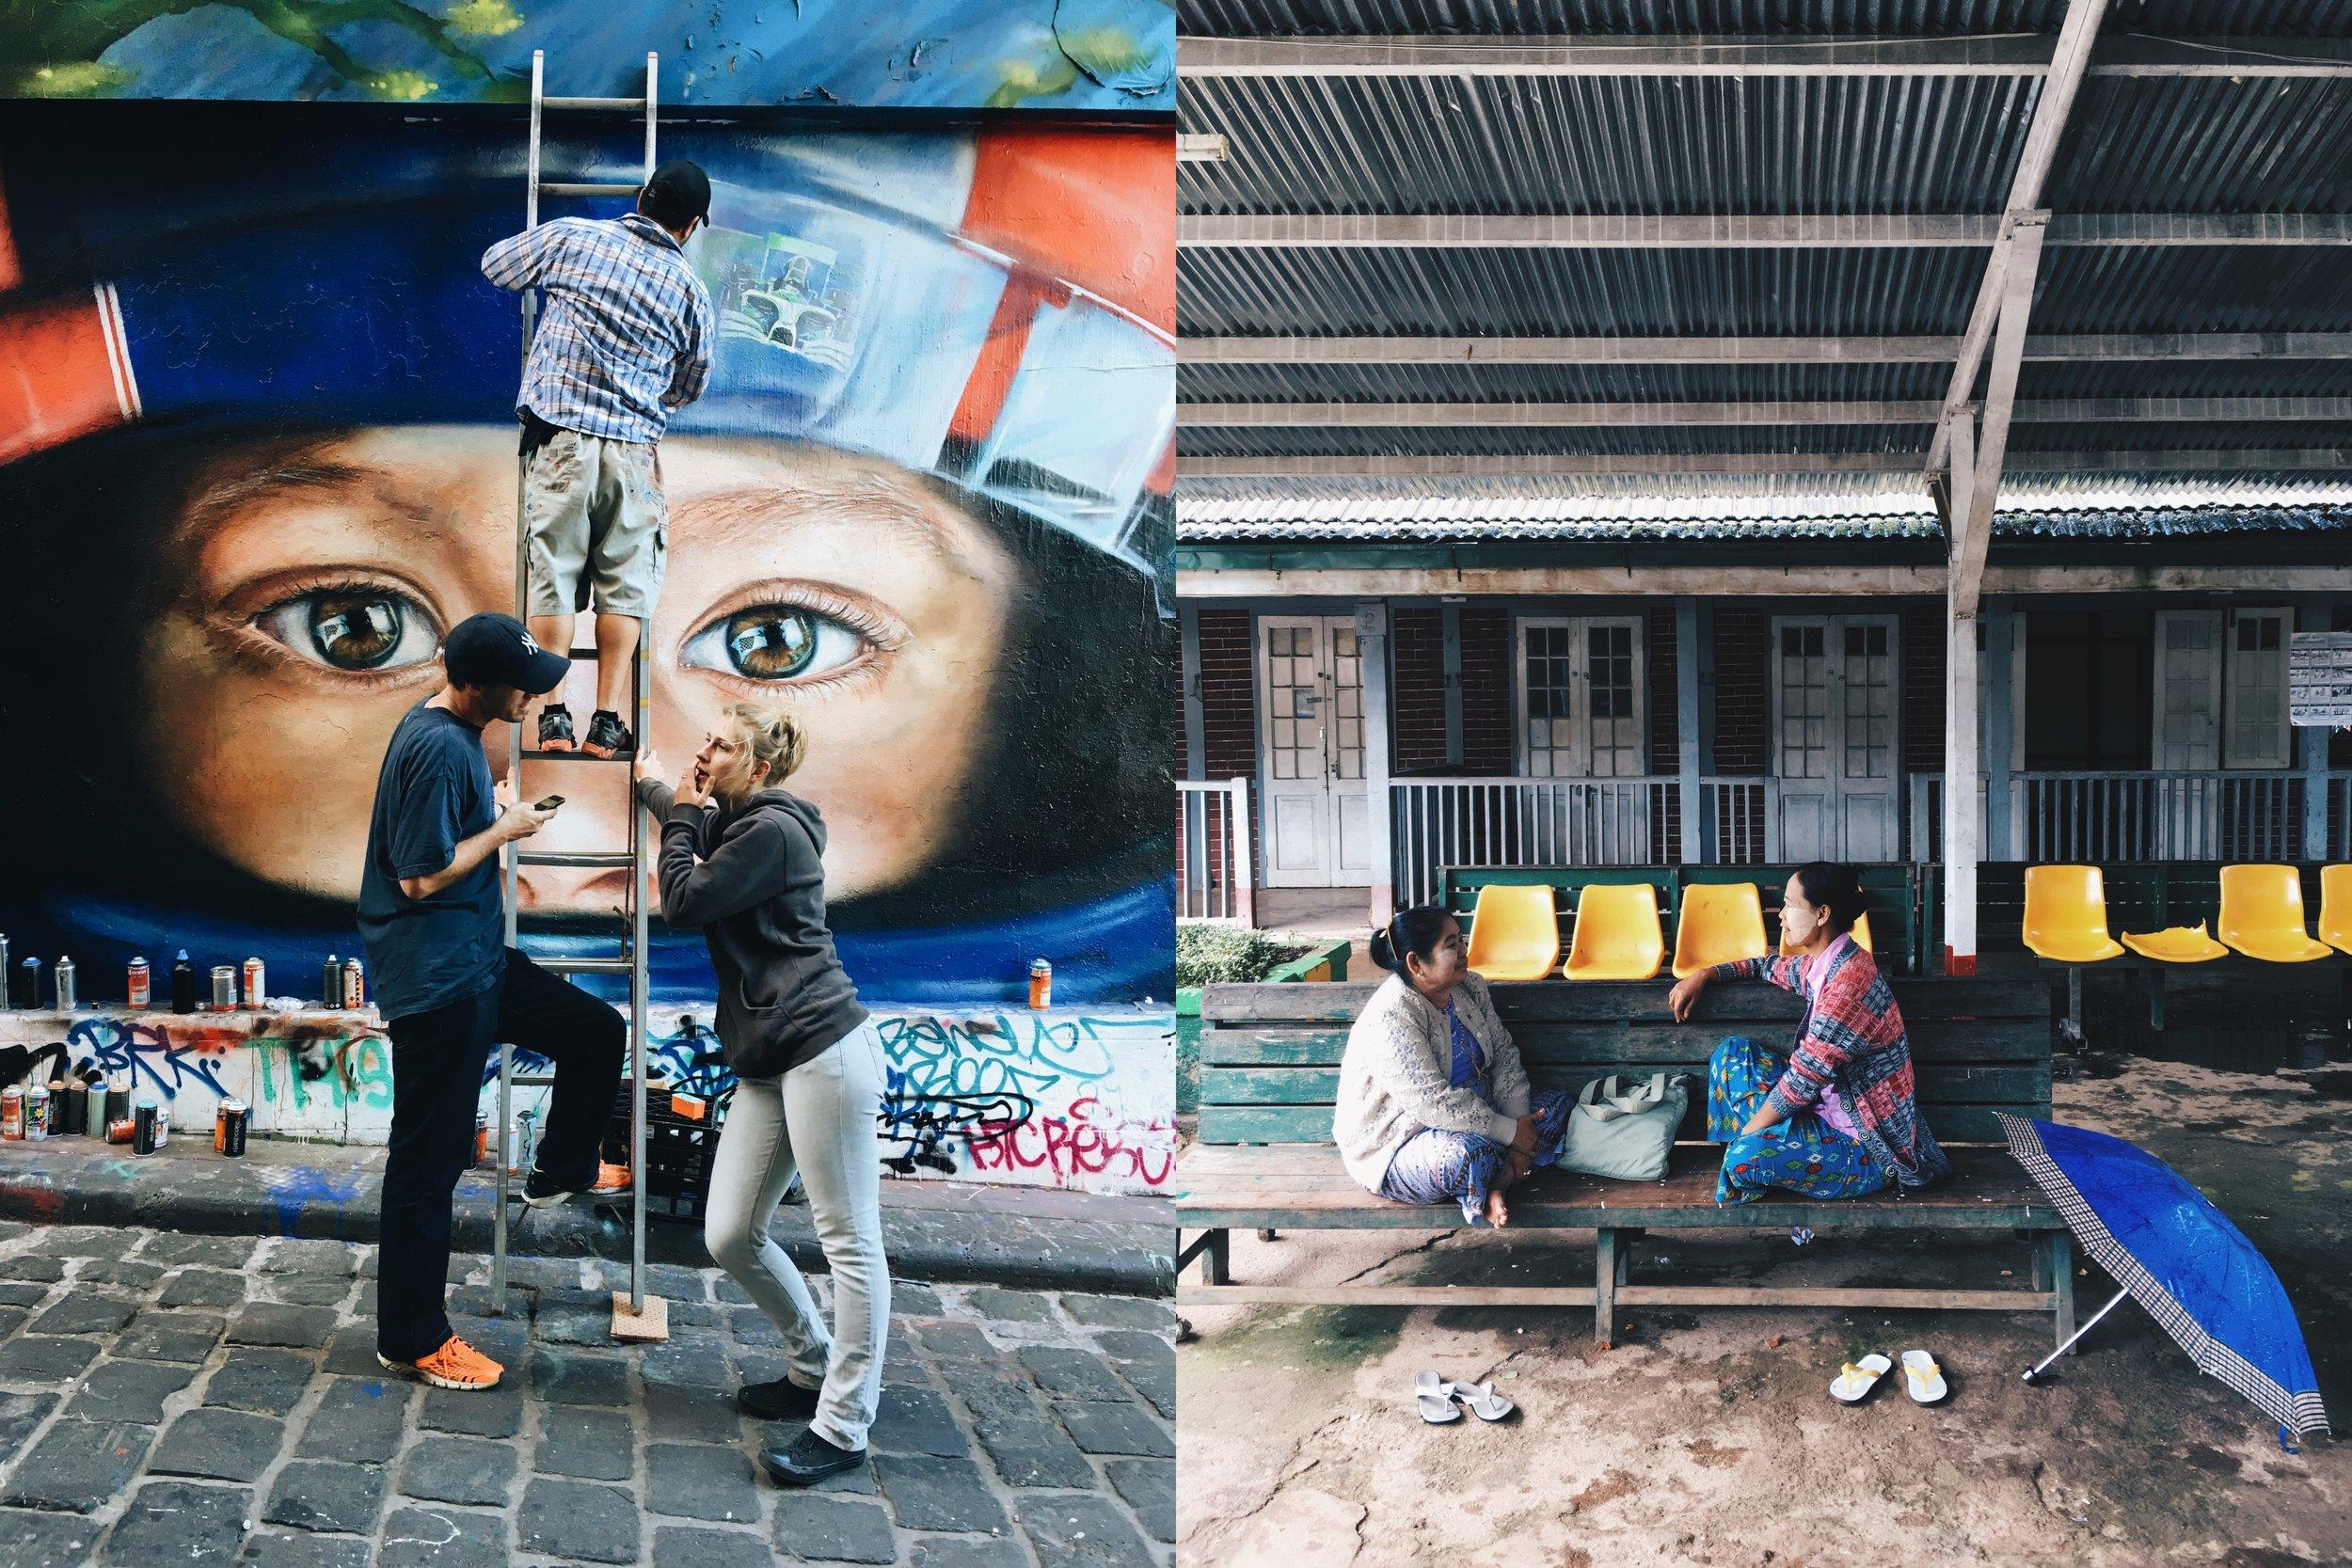 Conversation (Melbourne, Australia; and Kalaw, Myanmar)